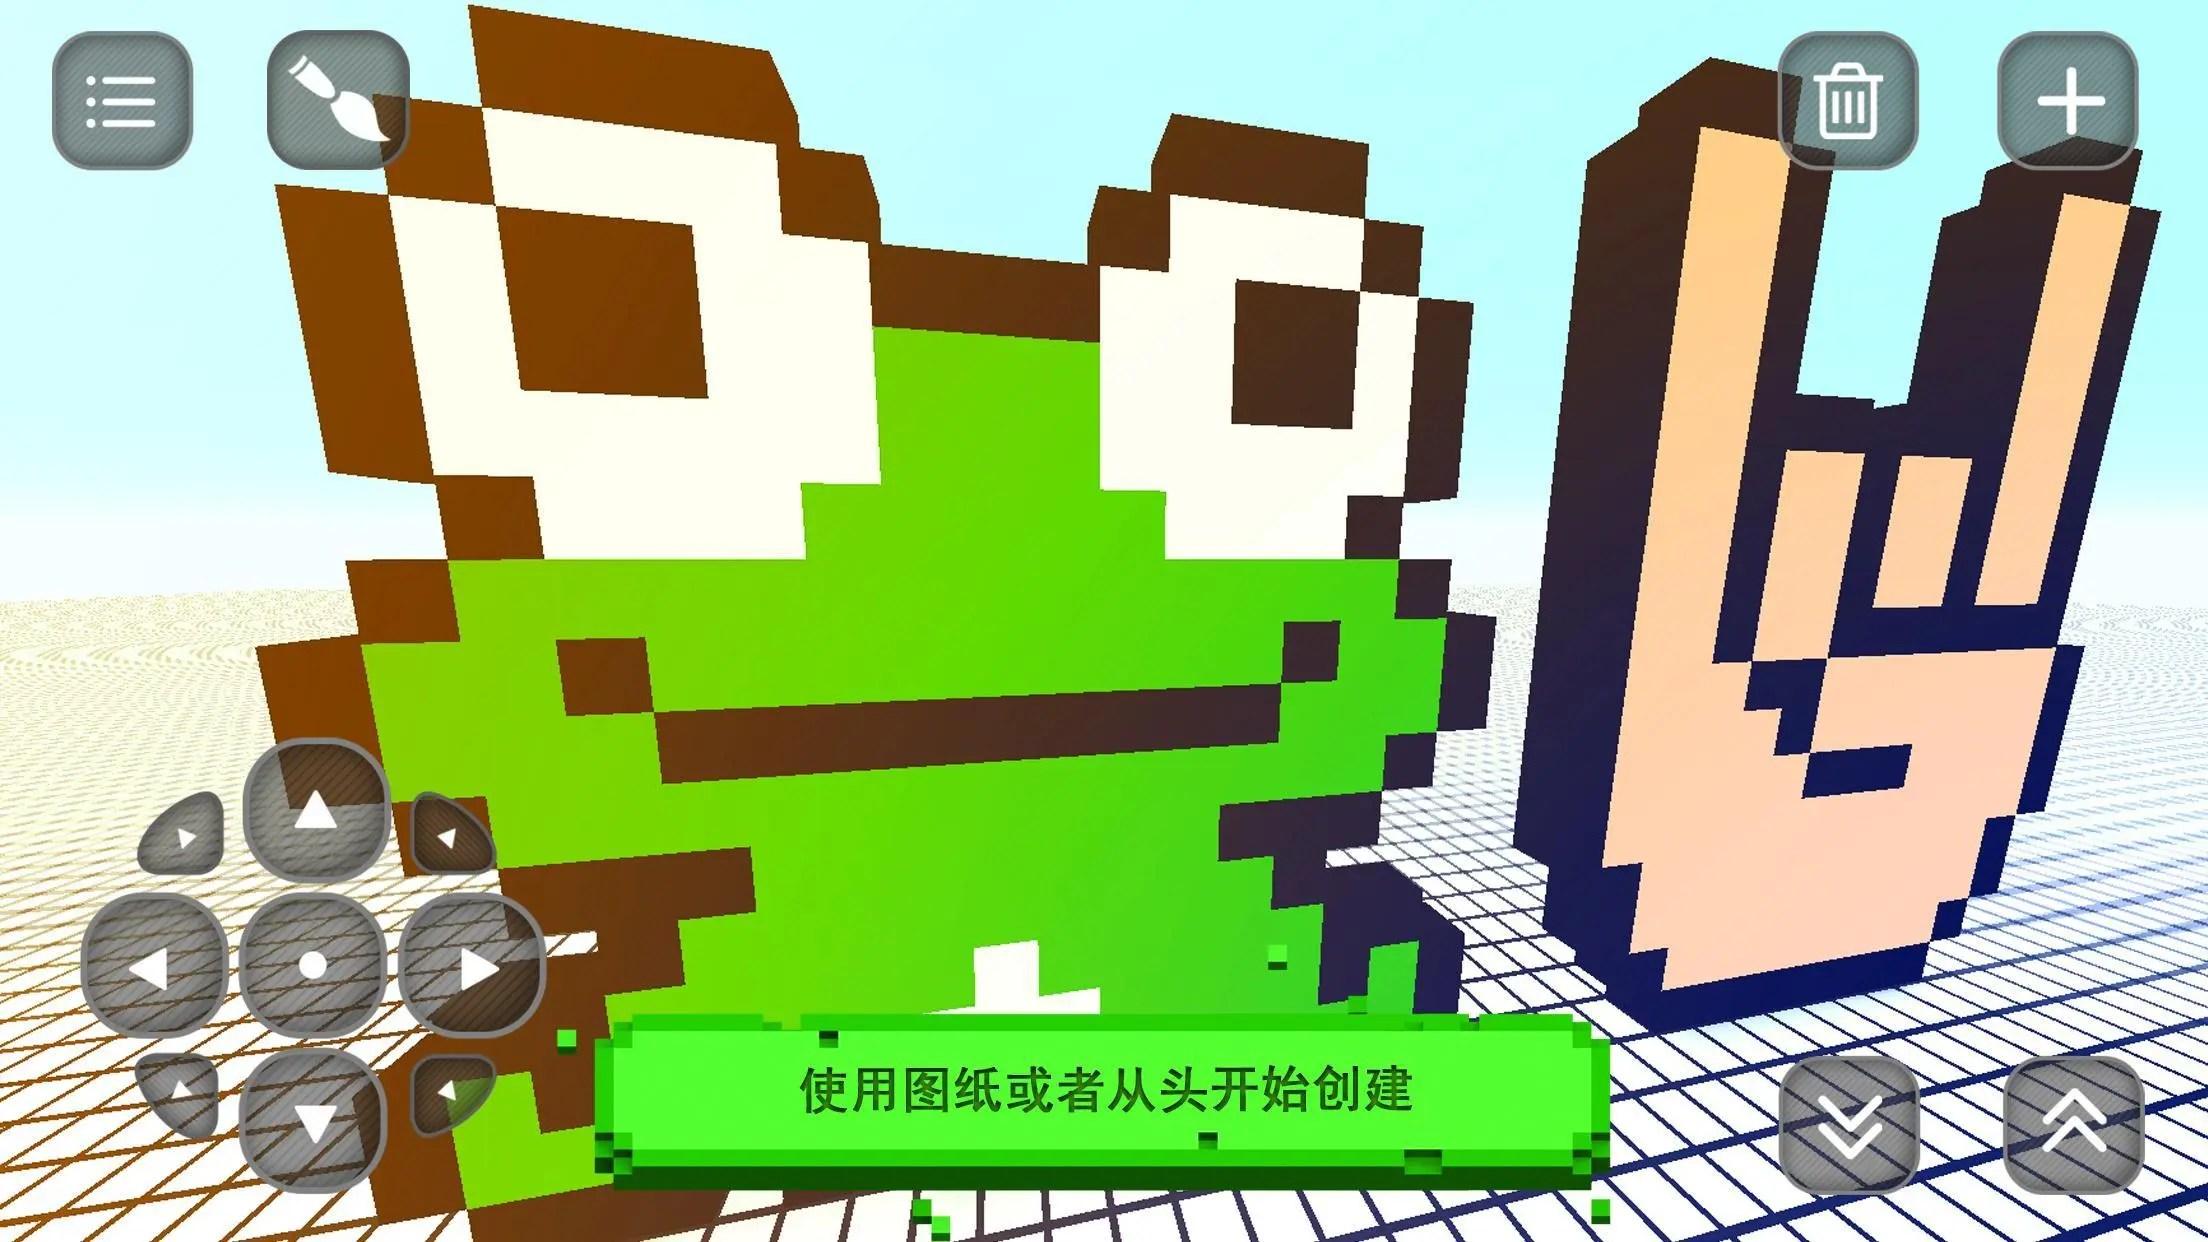 3D工藝:像素畫創作者 | TapTap 發現好遊戲